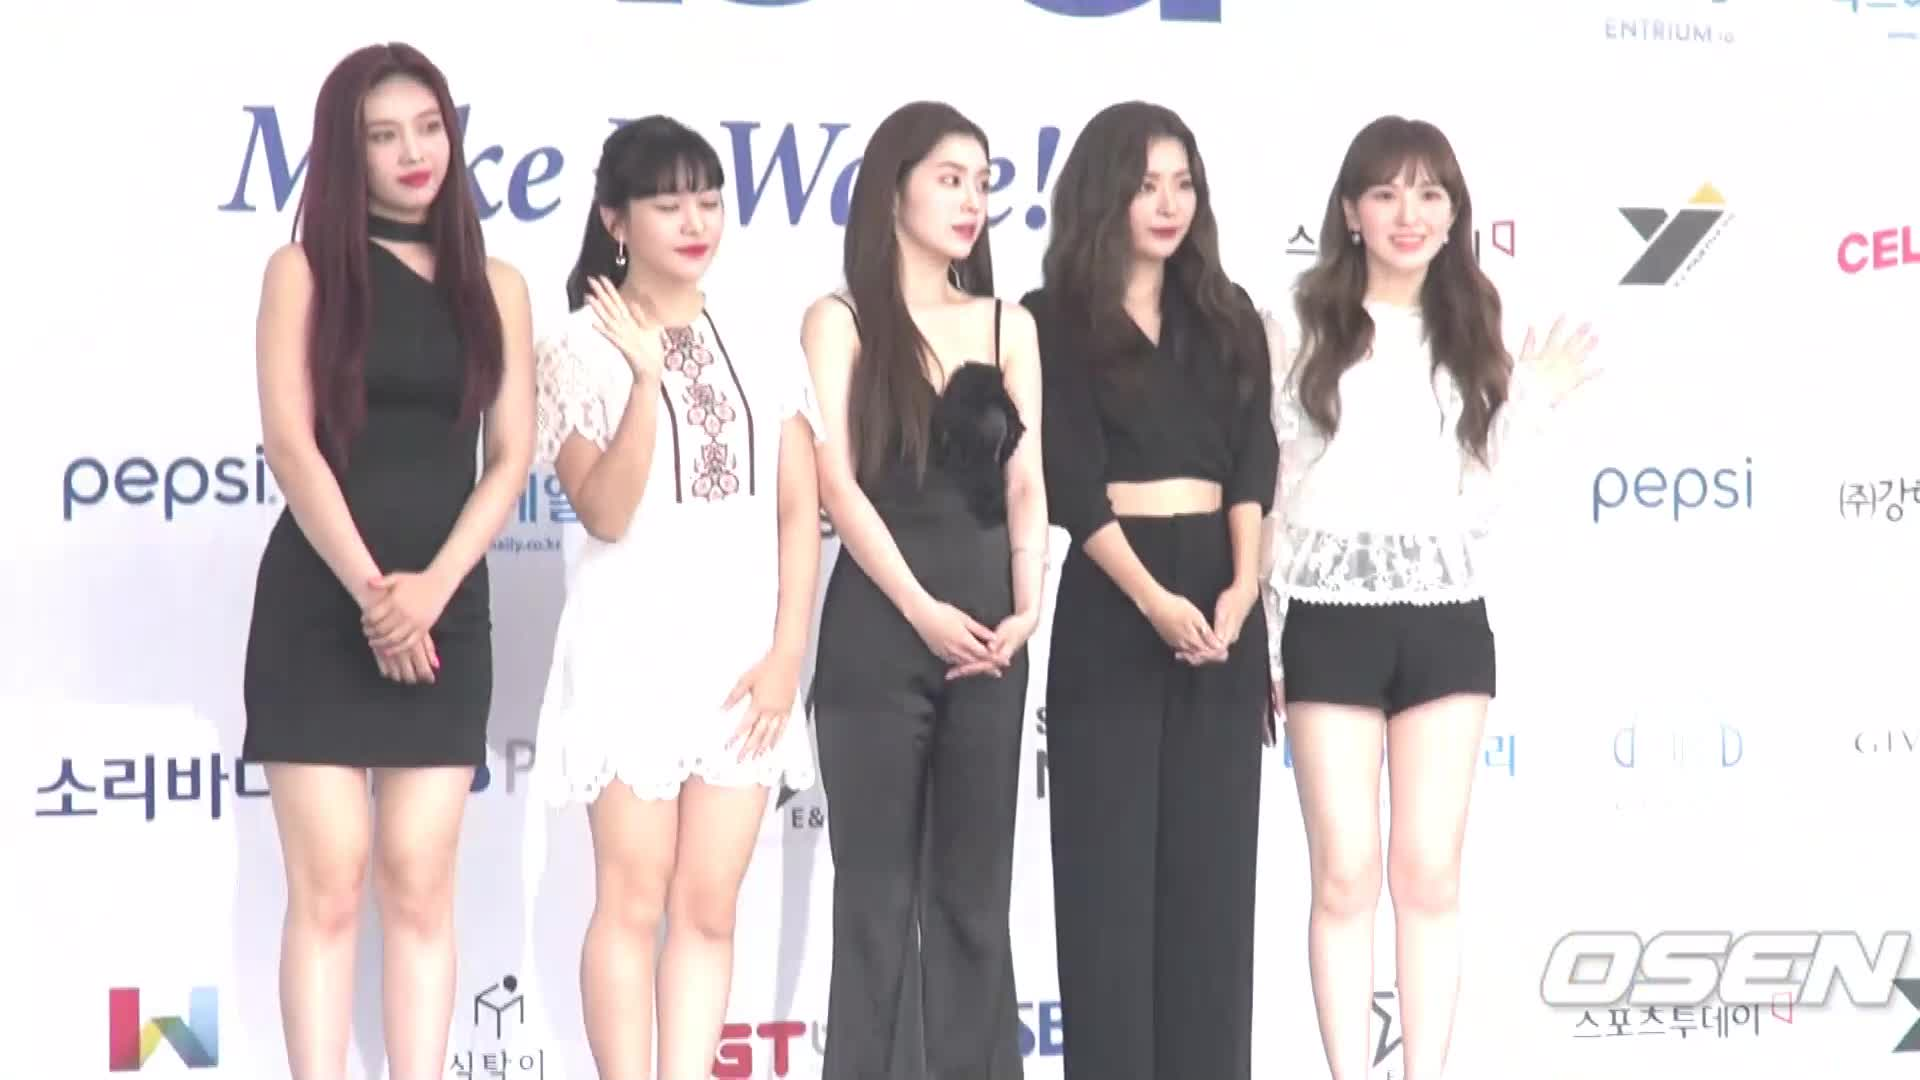 [Oh! 모션]레드벨벳(Red Velvet) 소리바다 베스트 케이뮤직 어워즈 블루카펫